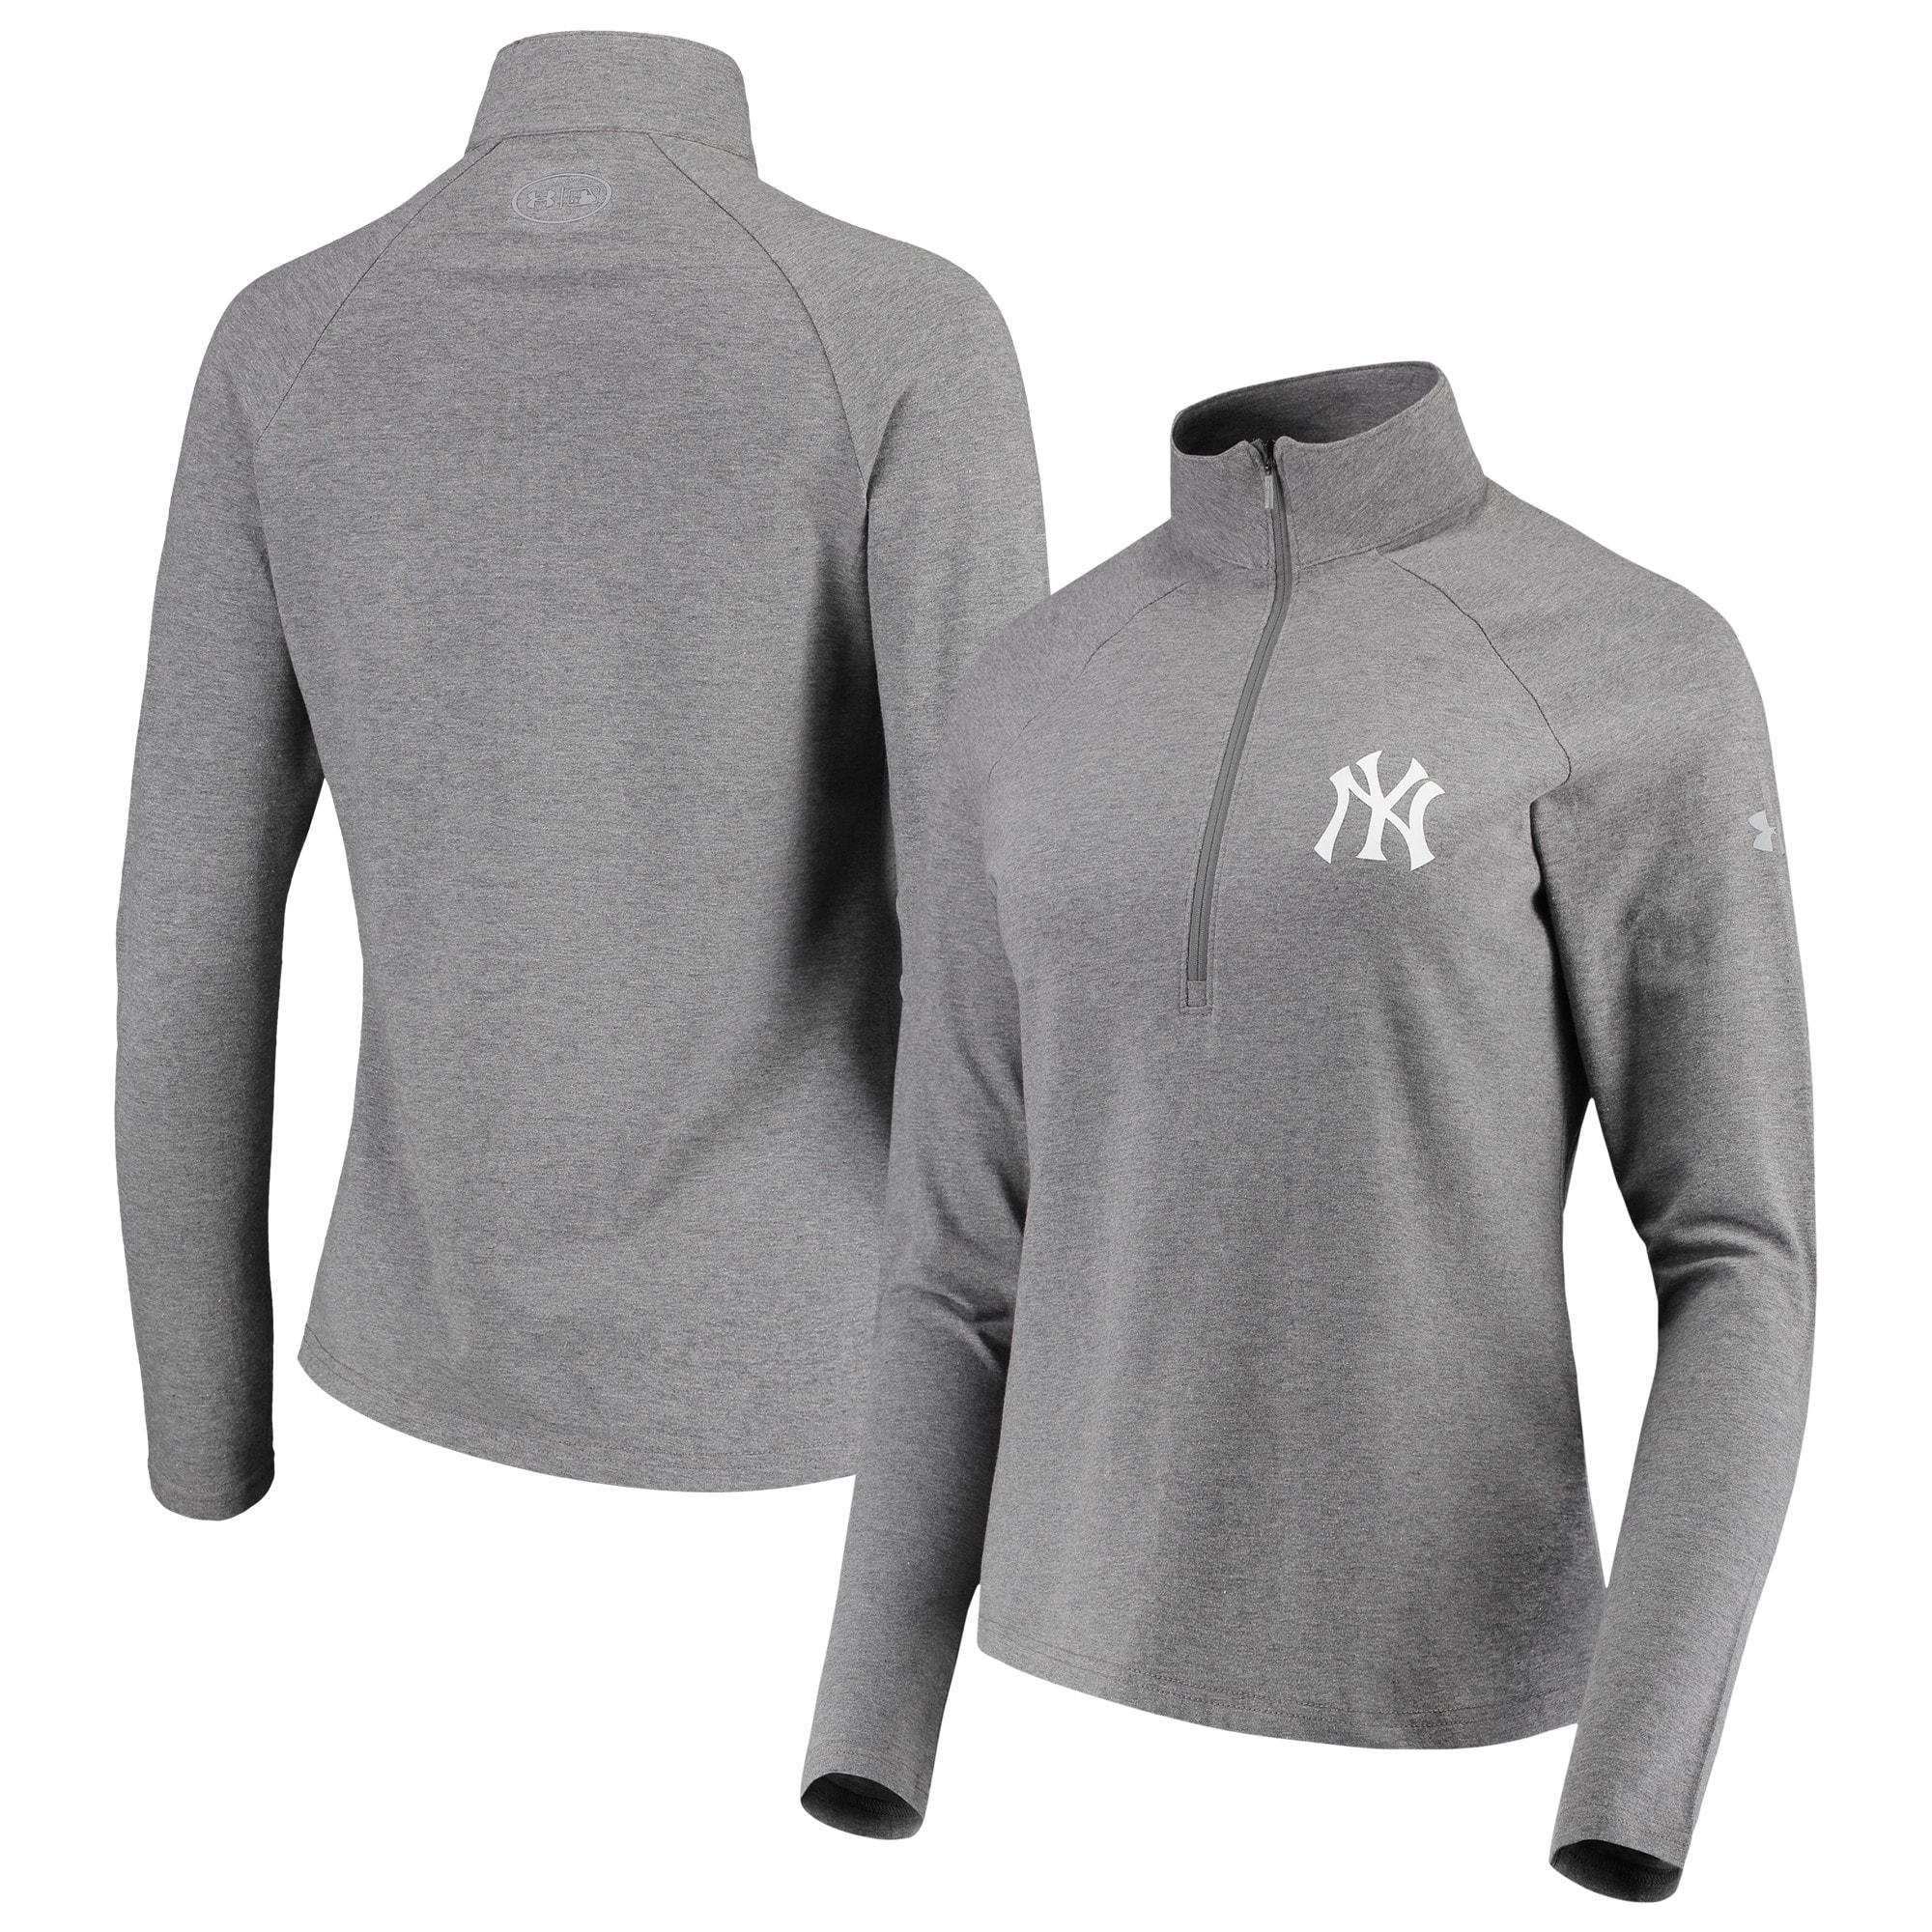 New York Yankees Under Armour Women's Passion Performance Tri-Blend Raglan Half-Zip Pullover Jacket - Heathered Gray